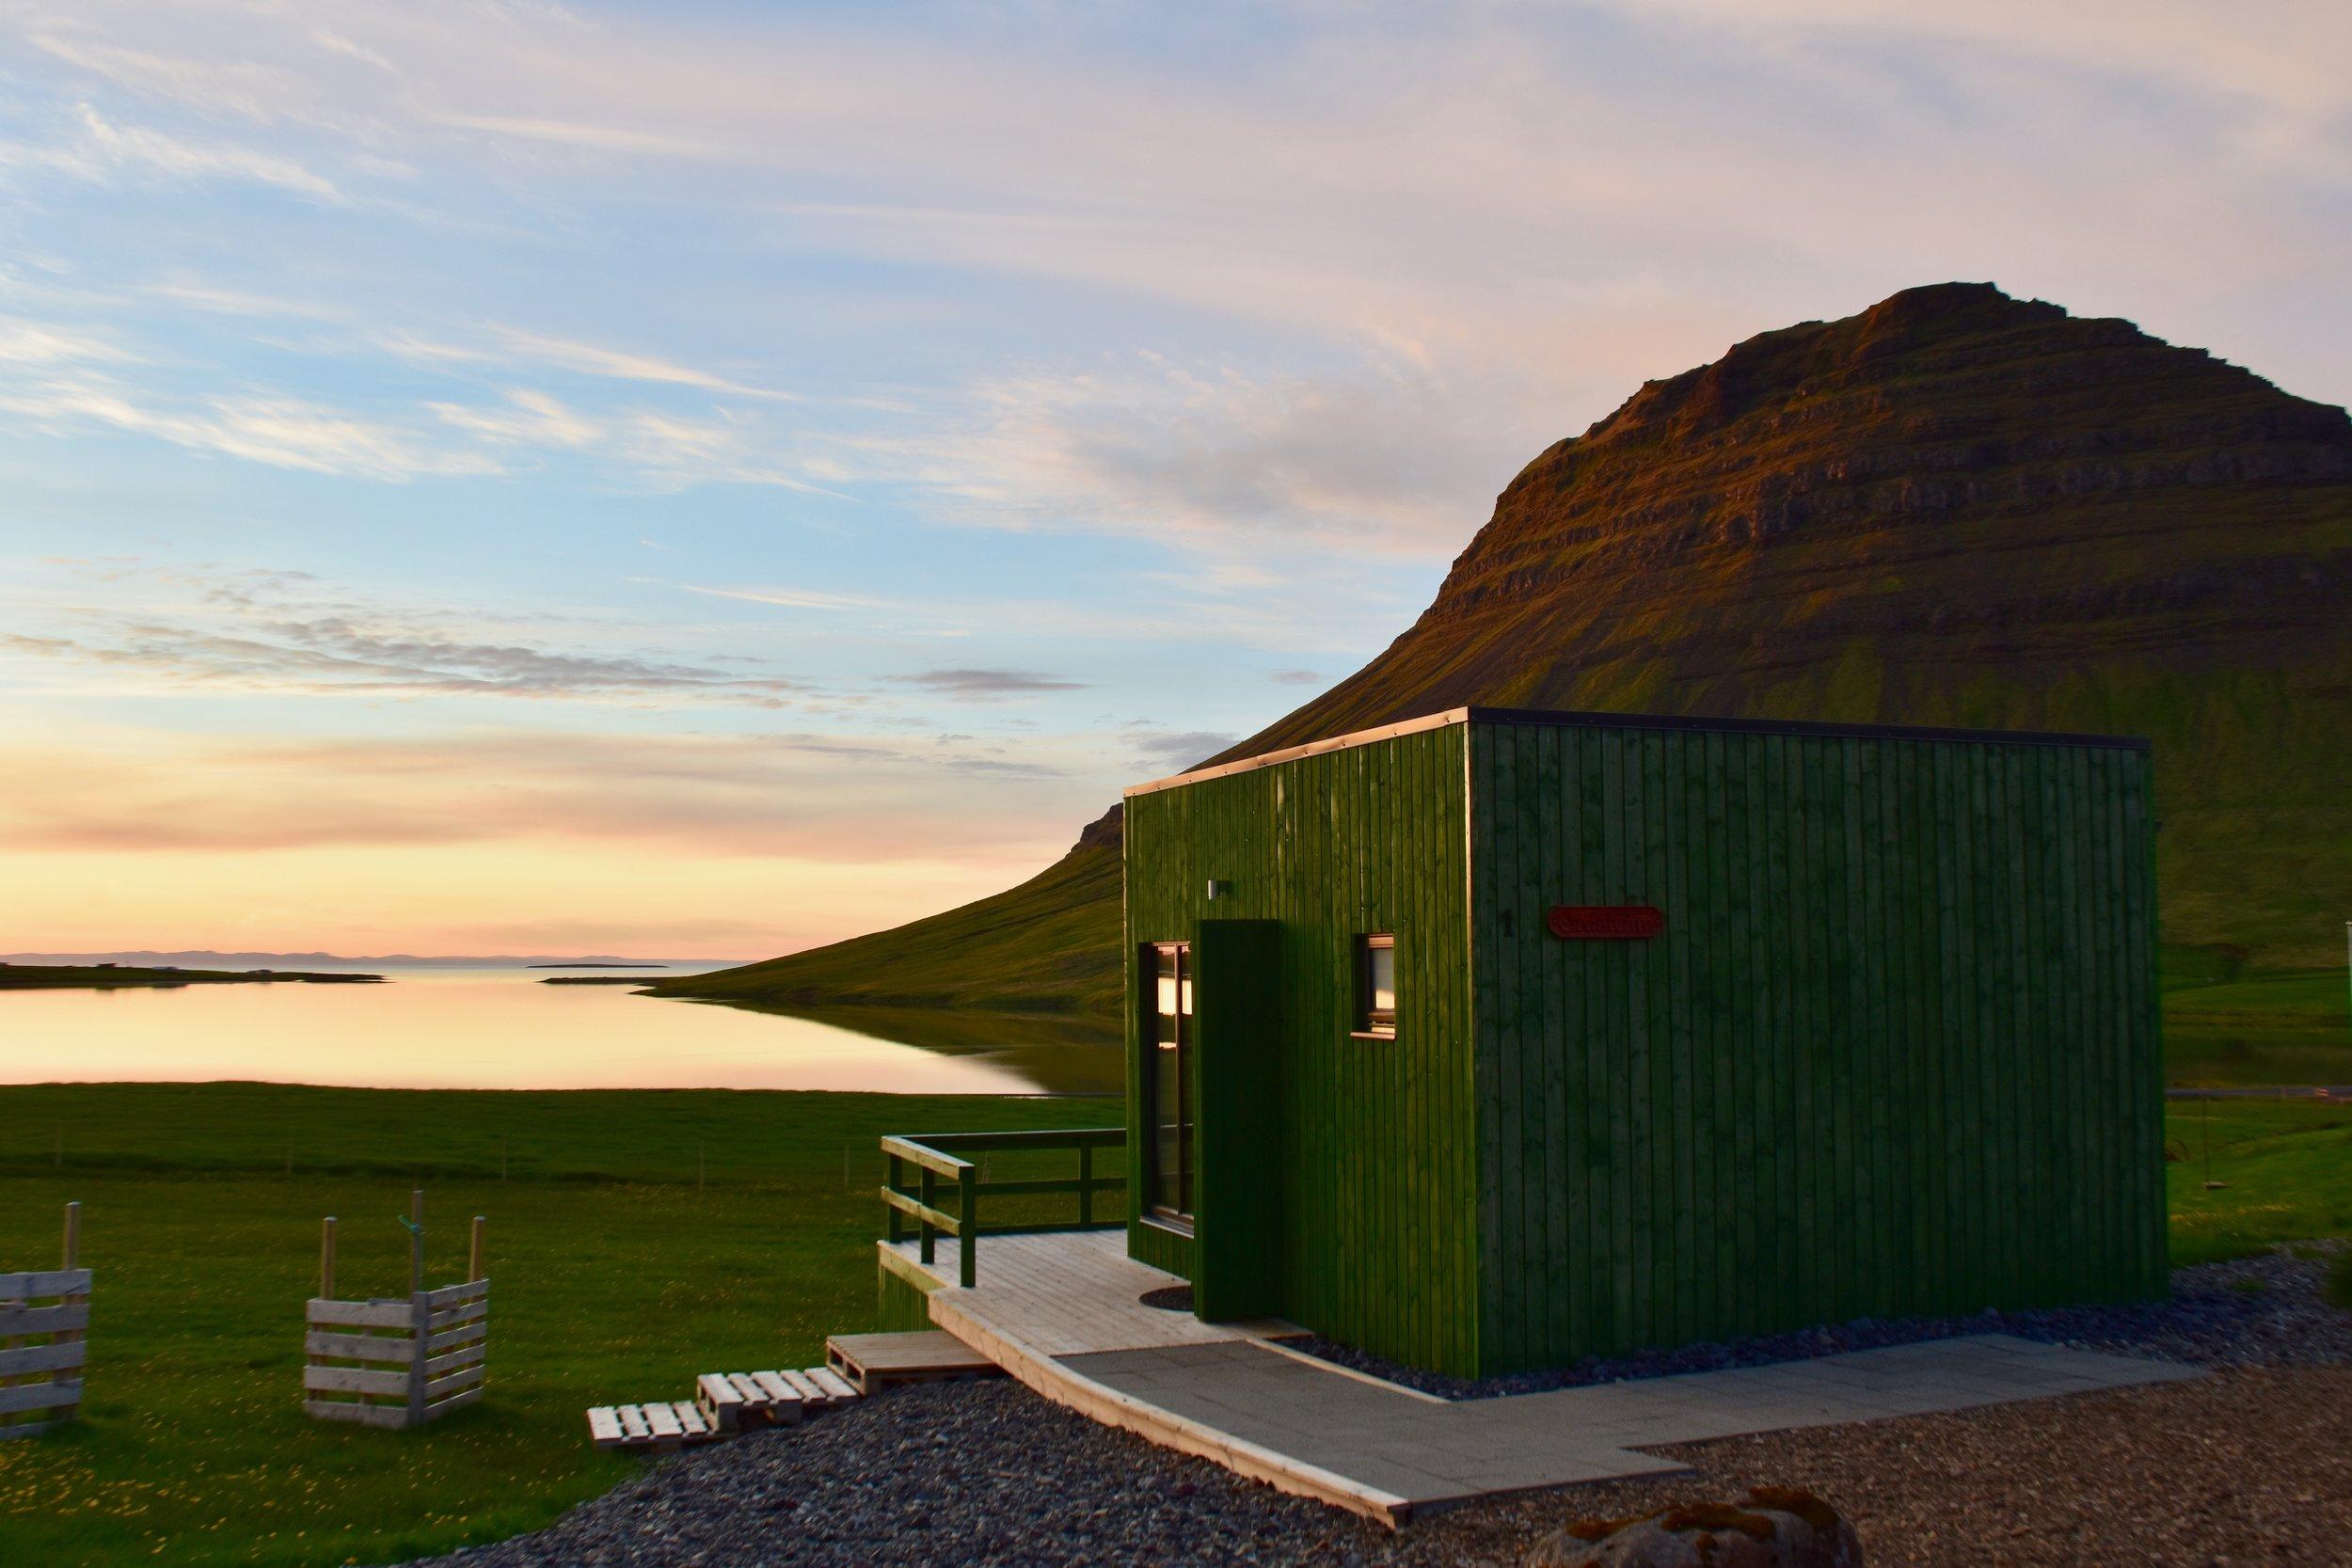 Our Airbnb cabin overlooking Kirkjufell on Snæfellsnes Peninsula